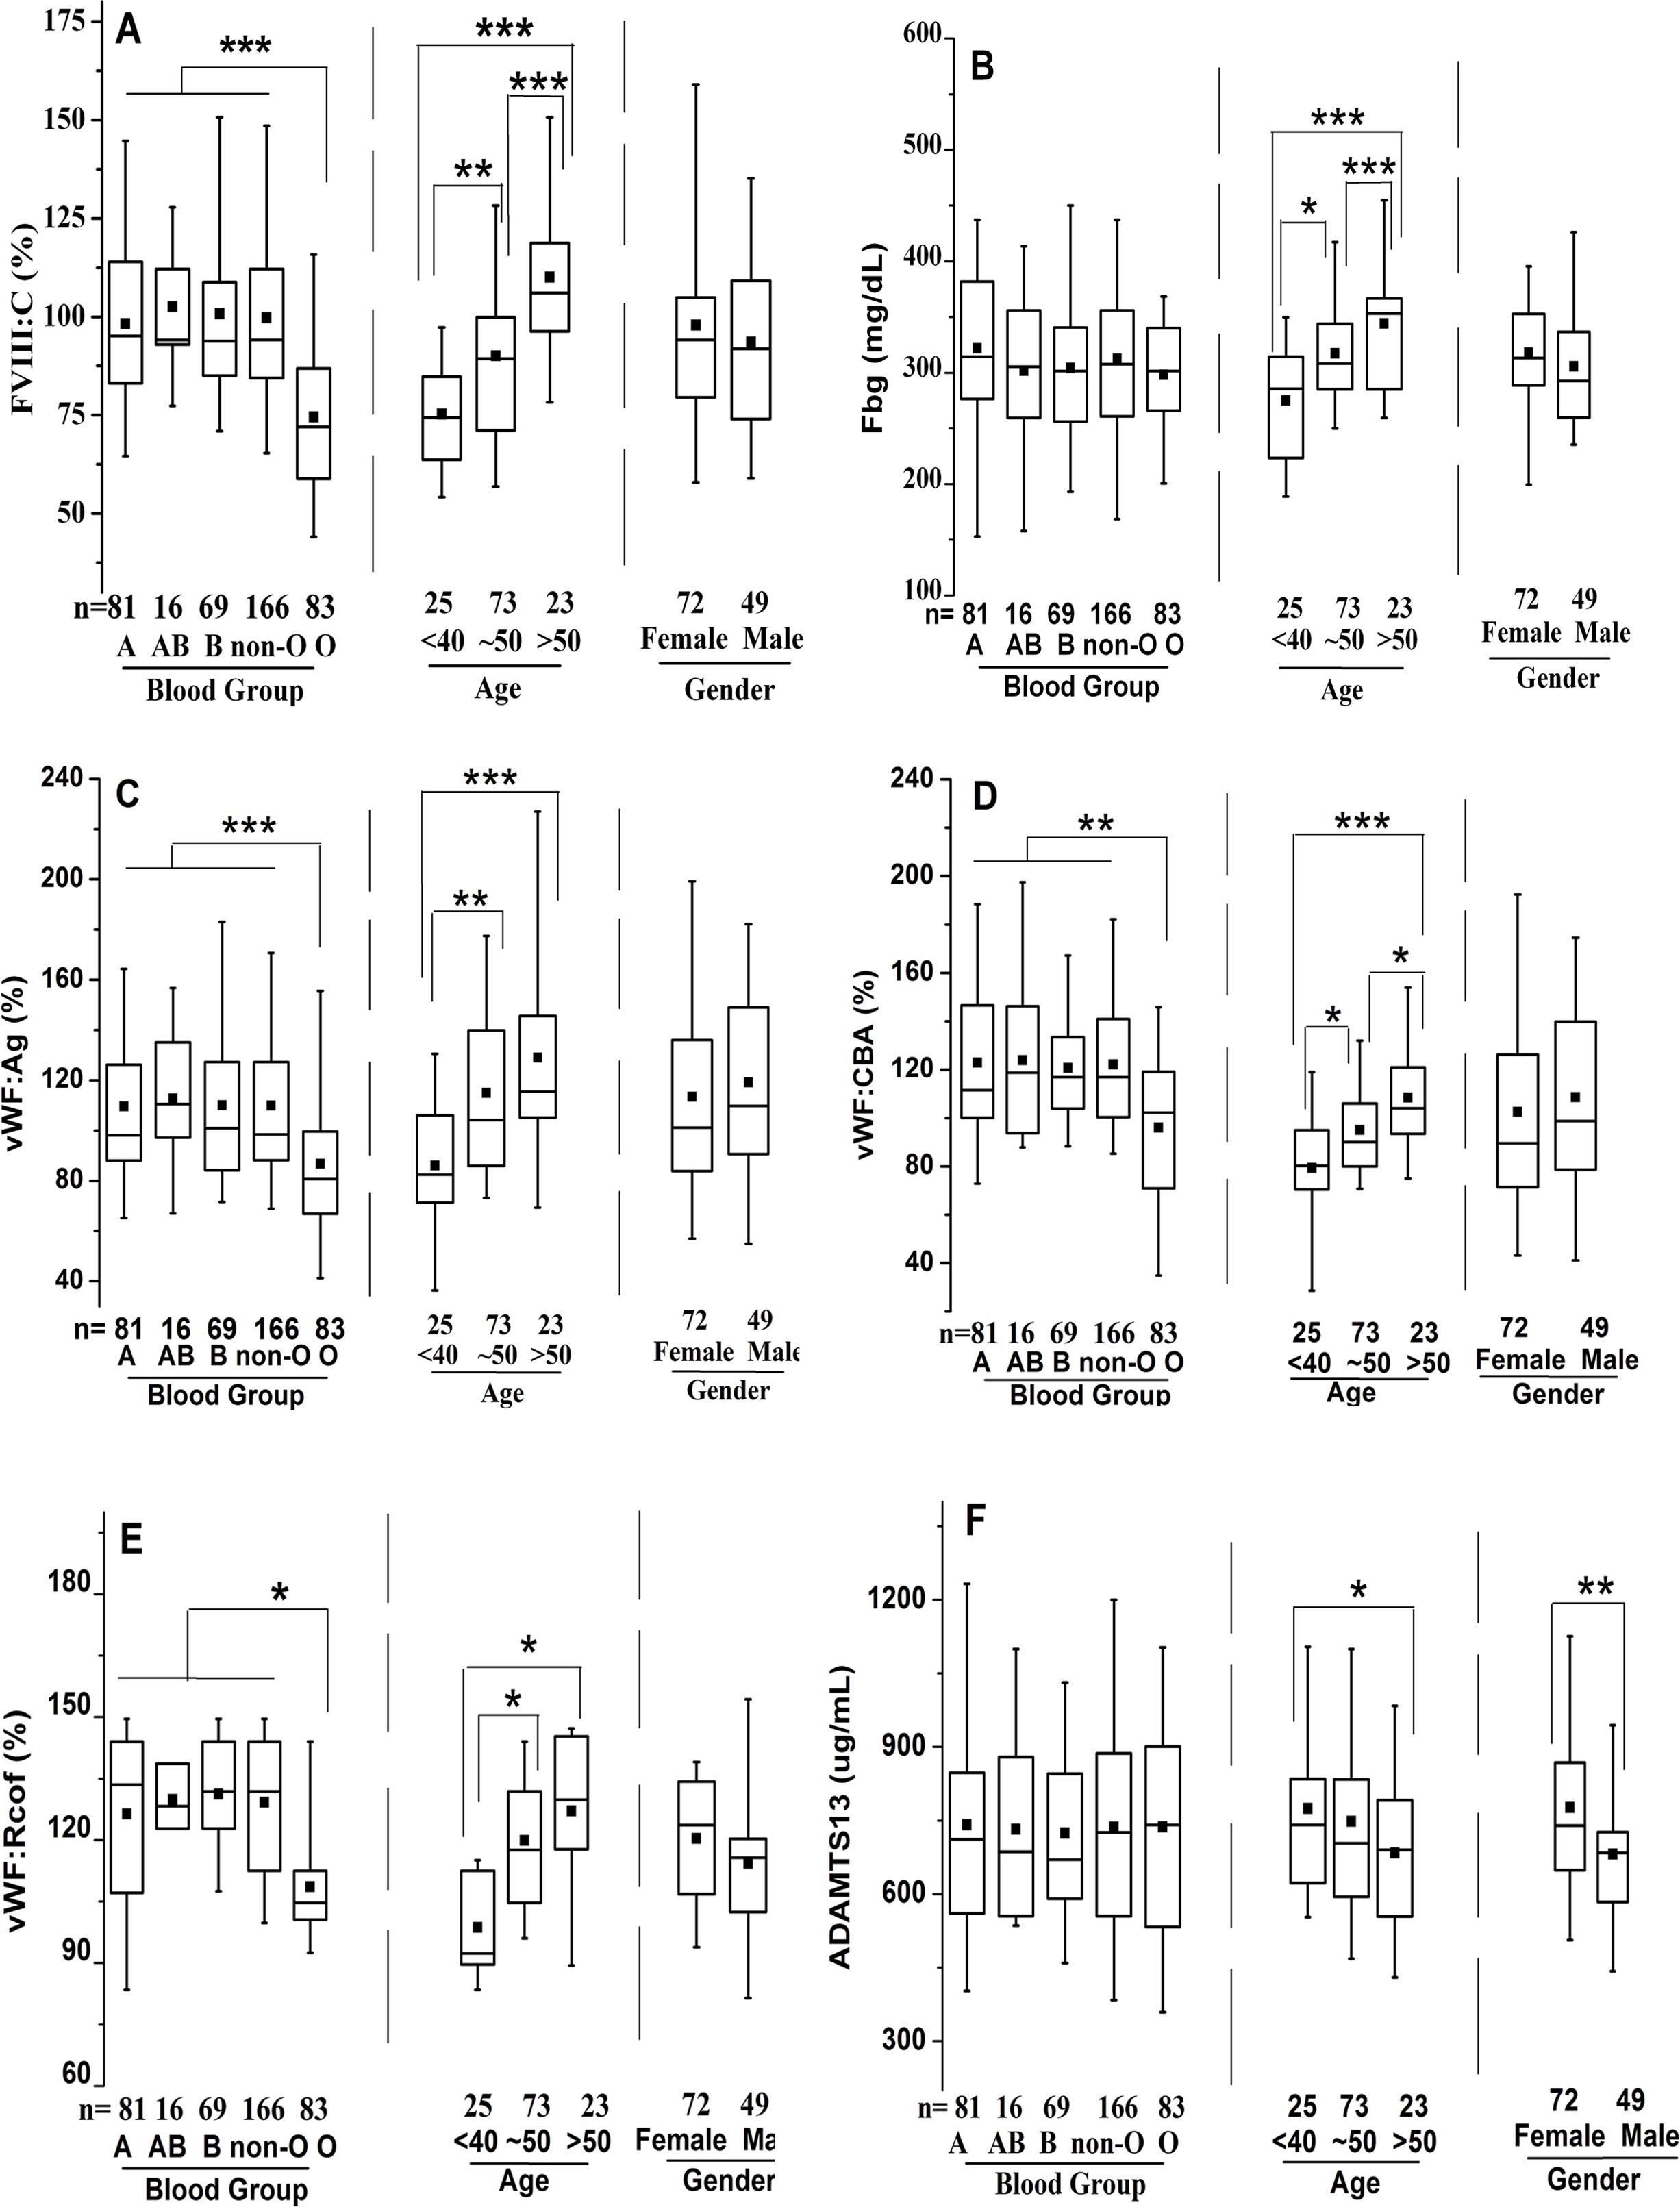 Influences of ABO blood group age and gender on plasma coagulation